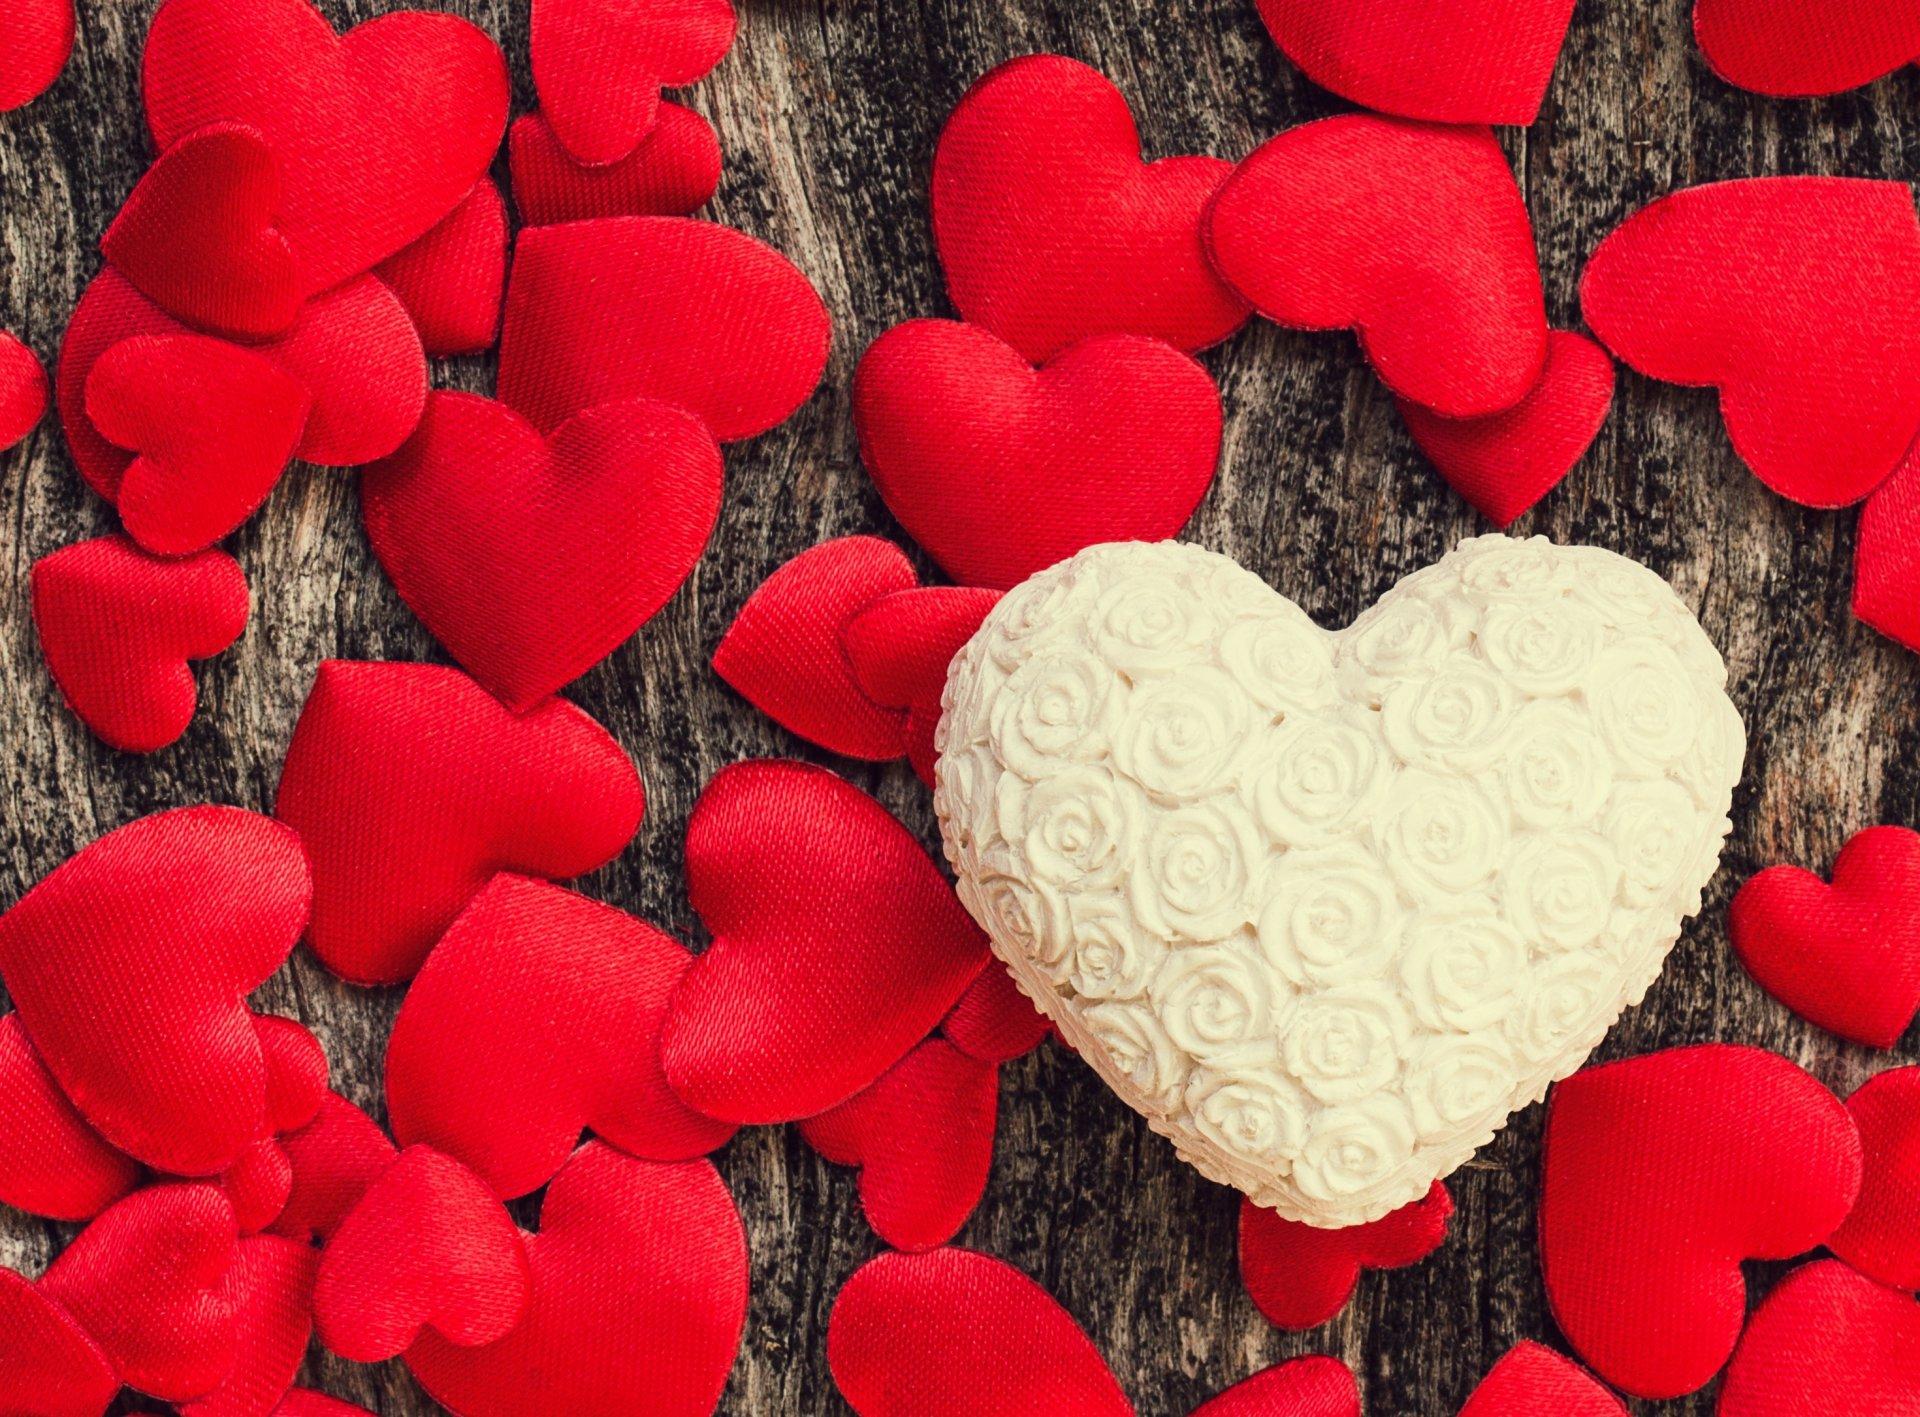 Сердечки картинки картинки, про любовь надписью